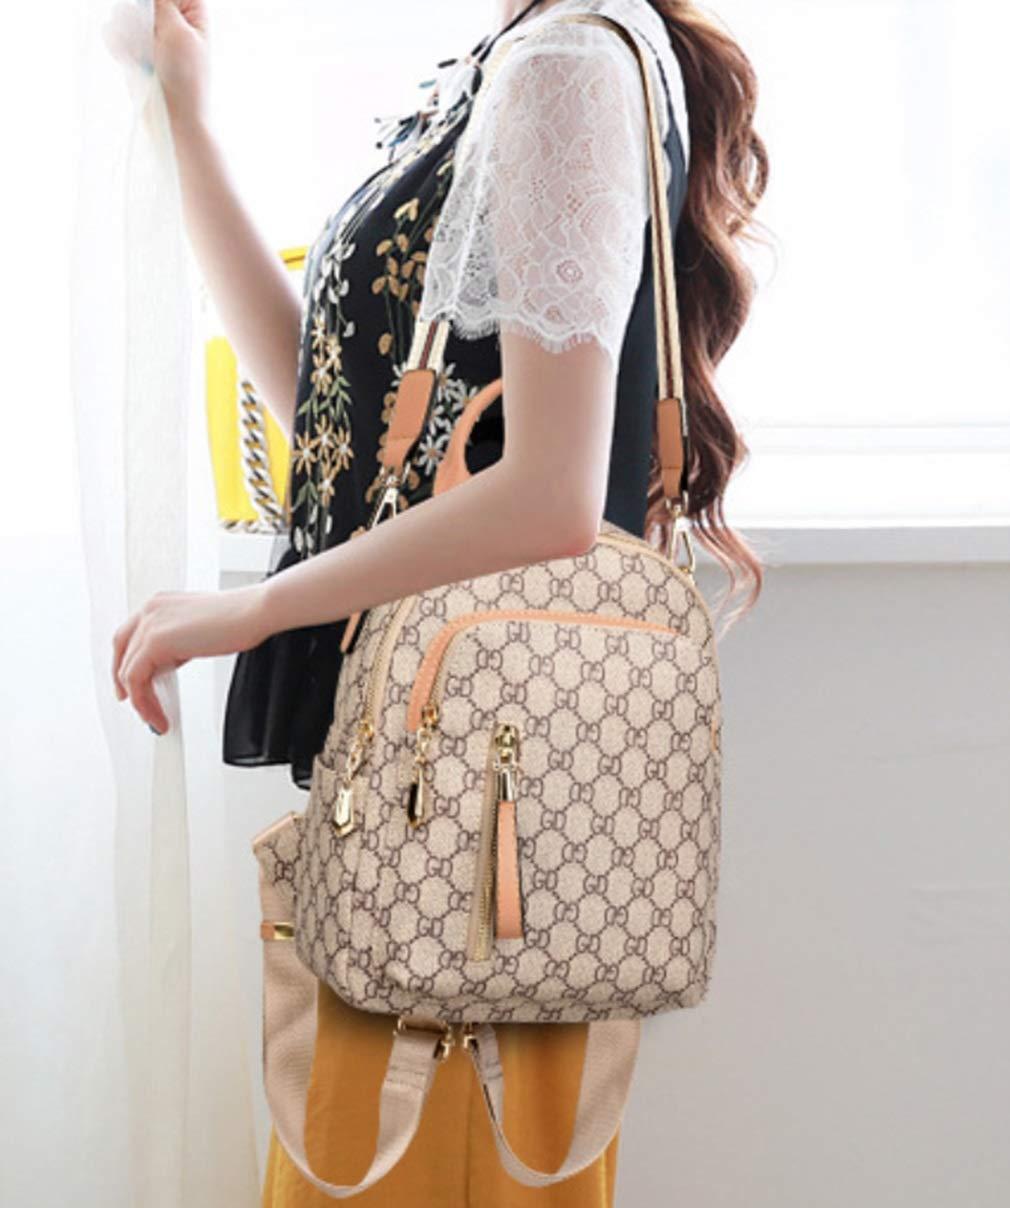 RSQJ Female Bag Shoulder Bag Small Bag Leisure Multi-Function Backpack (Color : C, Size : 22102cm) by RSQJ backpack (Image #3)